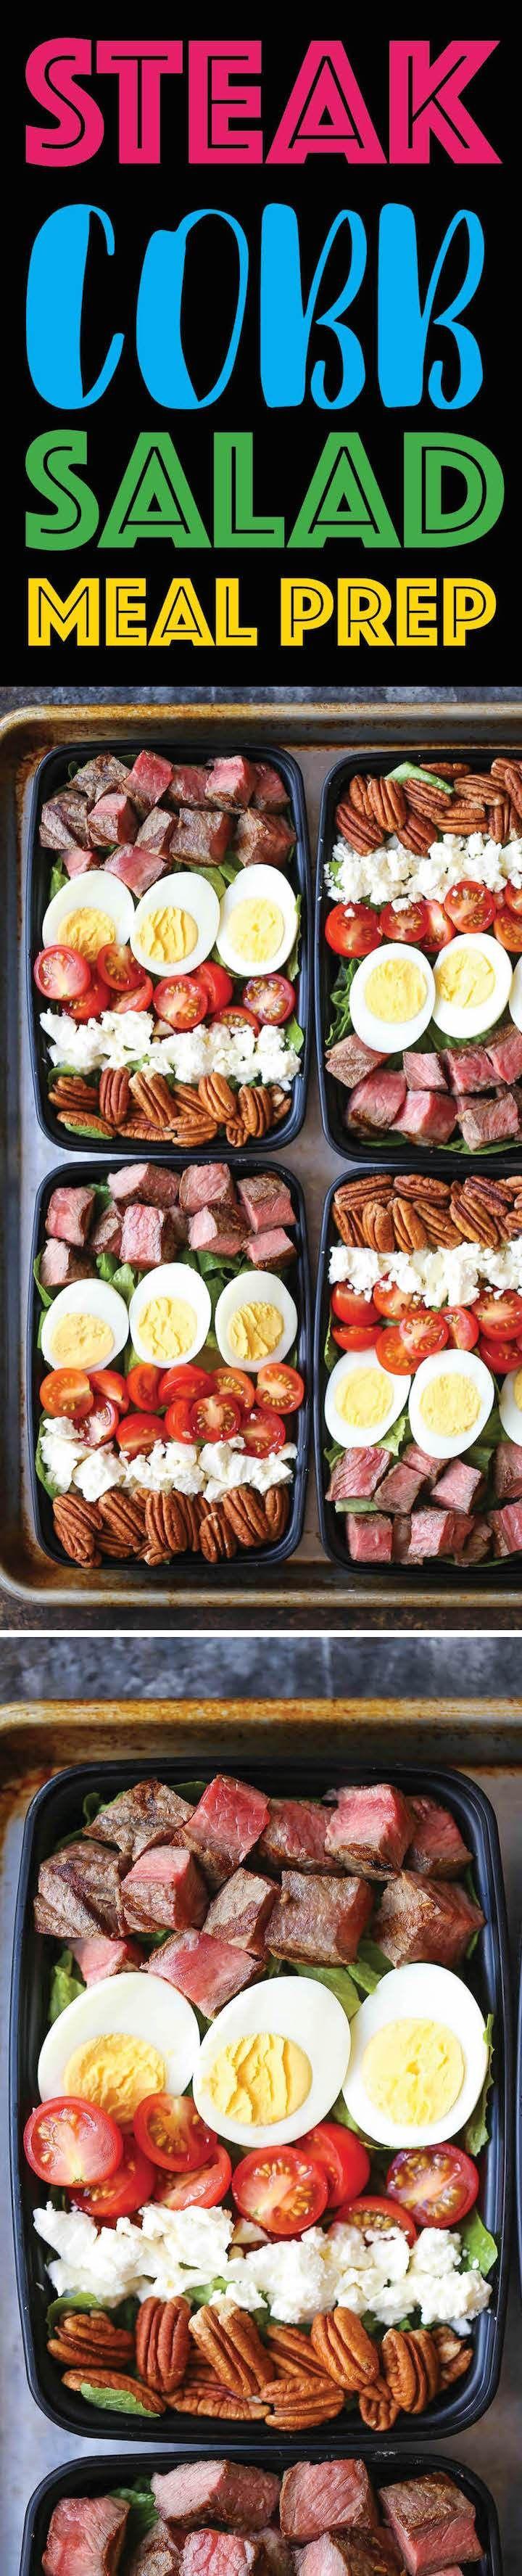 Steak Cobb Salad Meal Prep